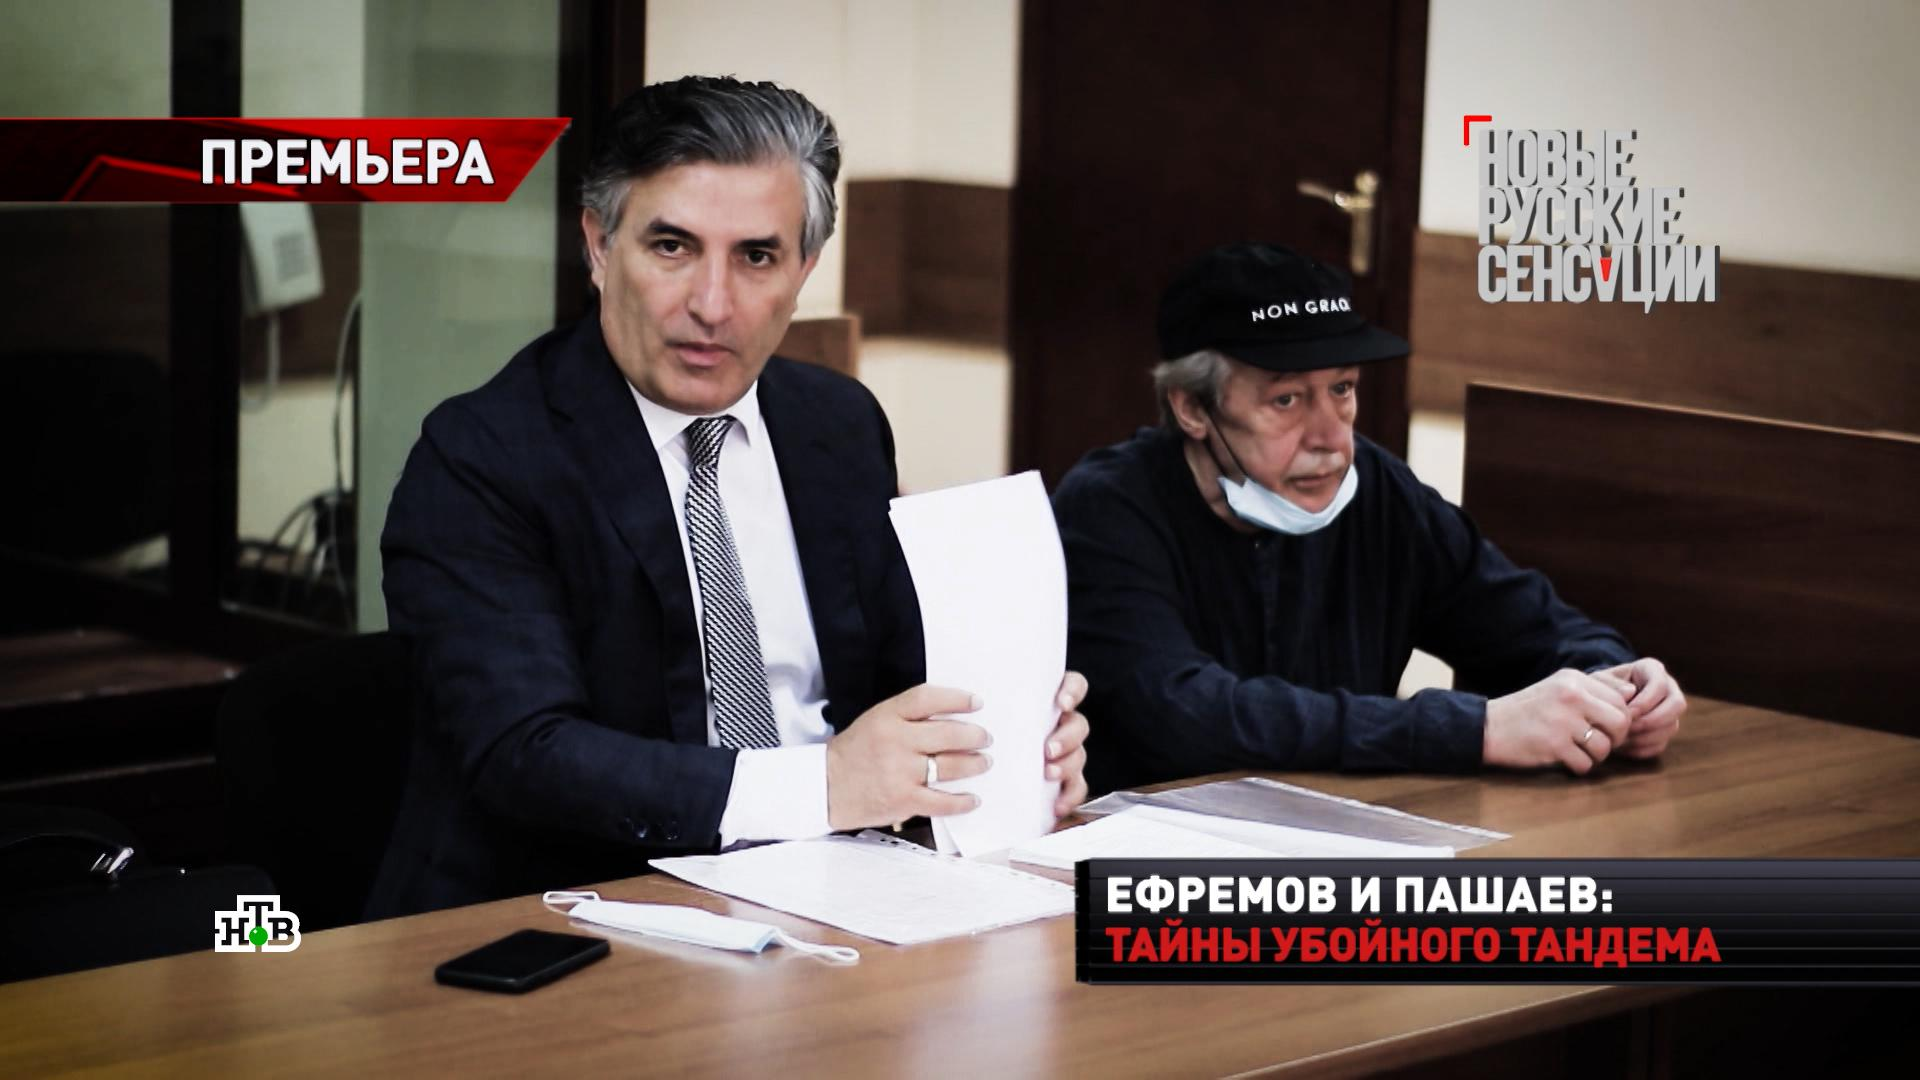 Адвокат Ефремова готов «разнести» обвинение